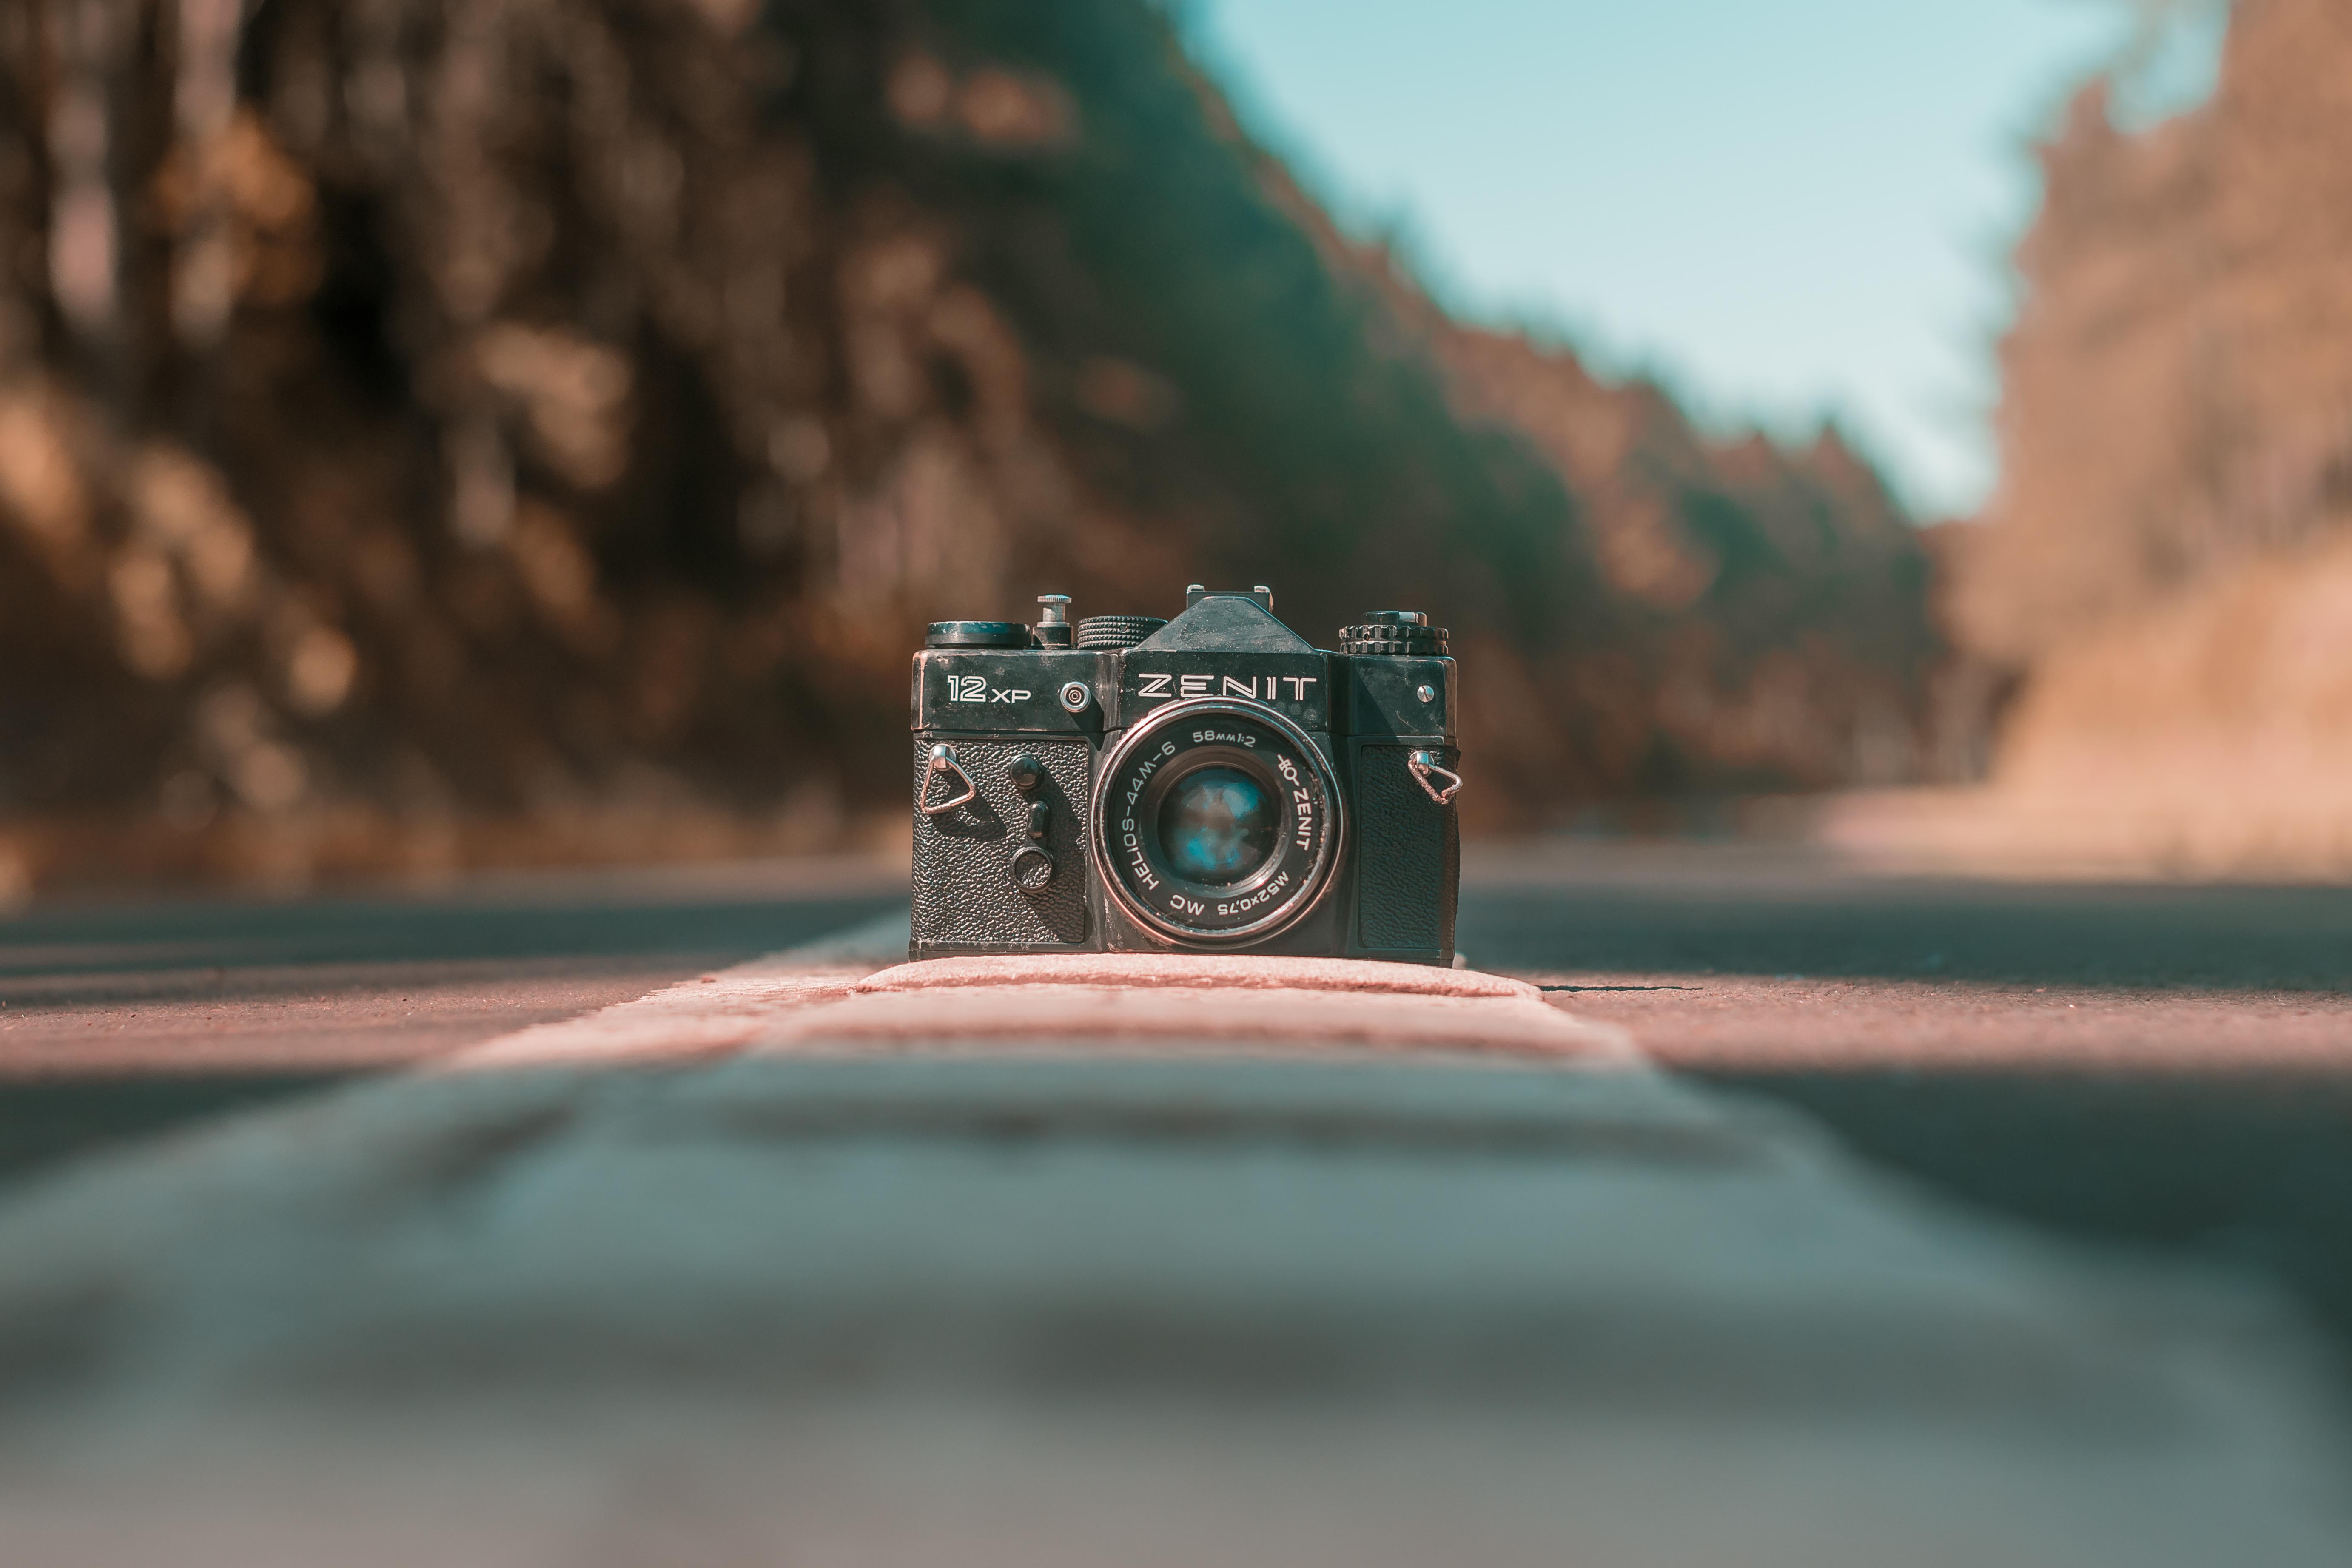 Zenit camera on road (Pic: Rogelio Rosa/Pexels)